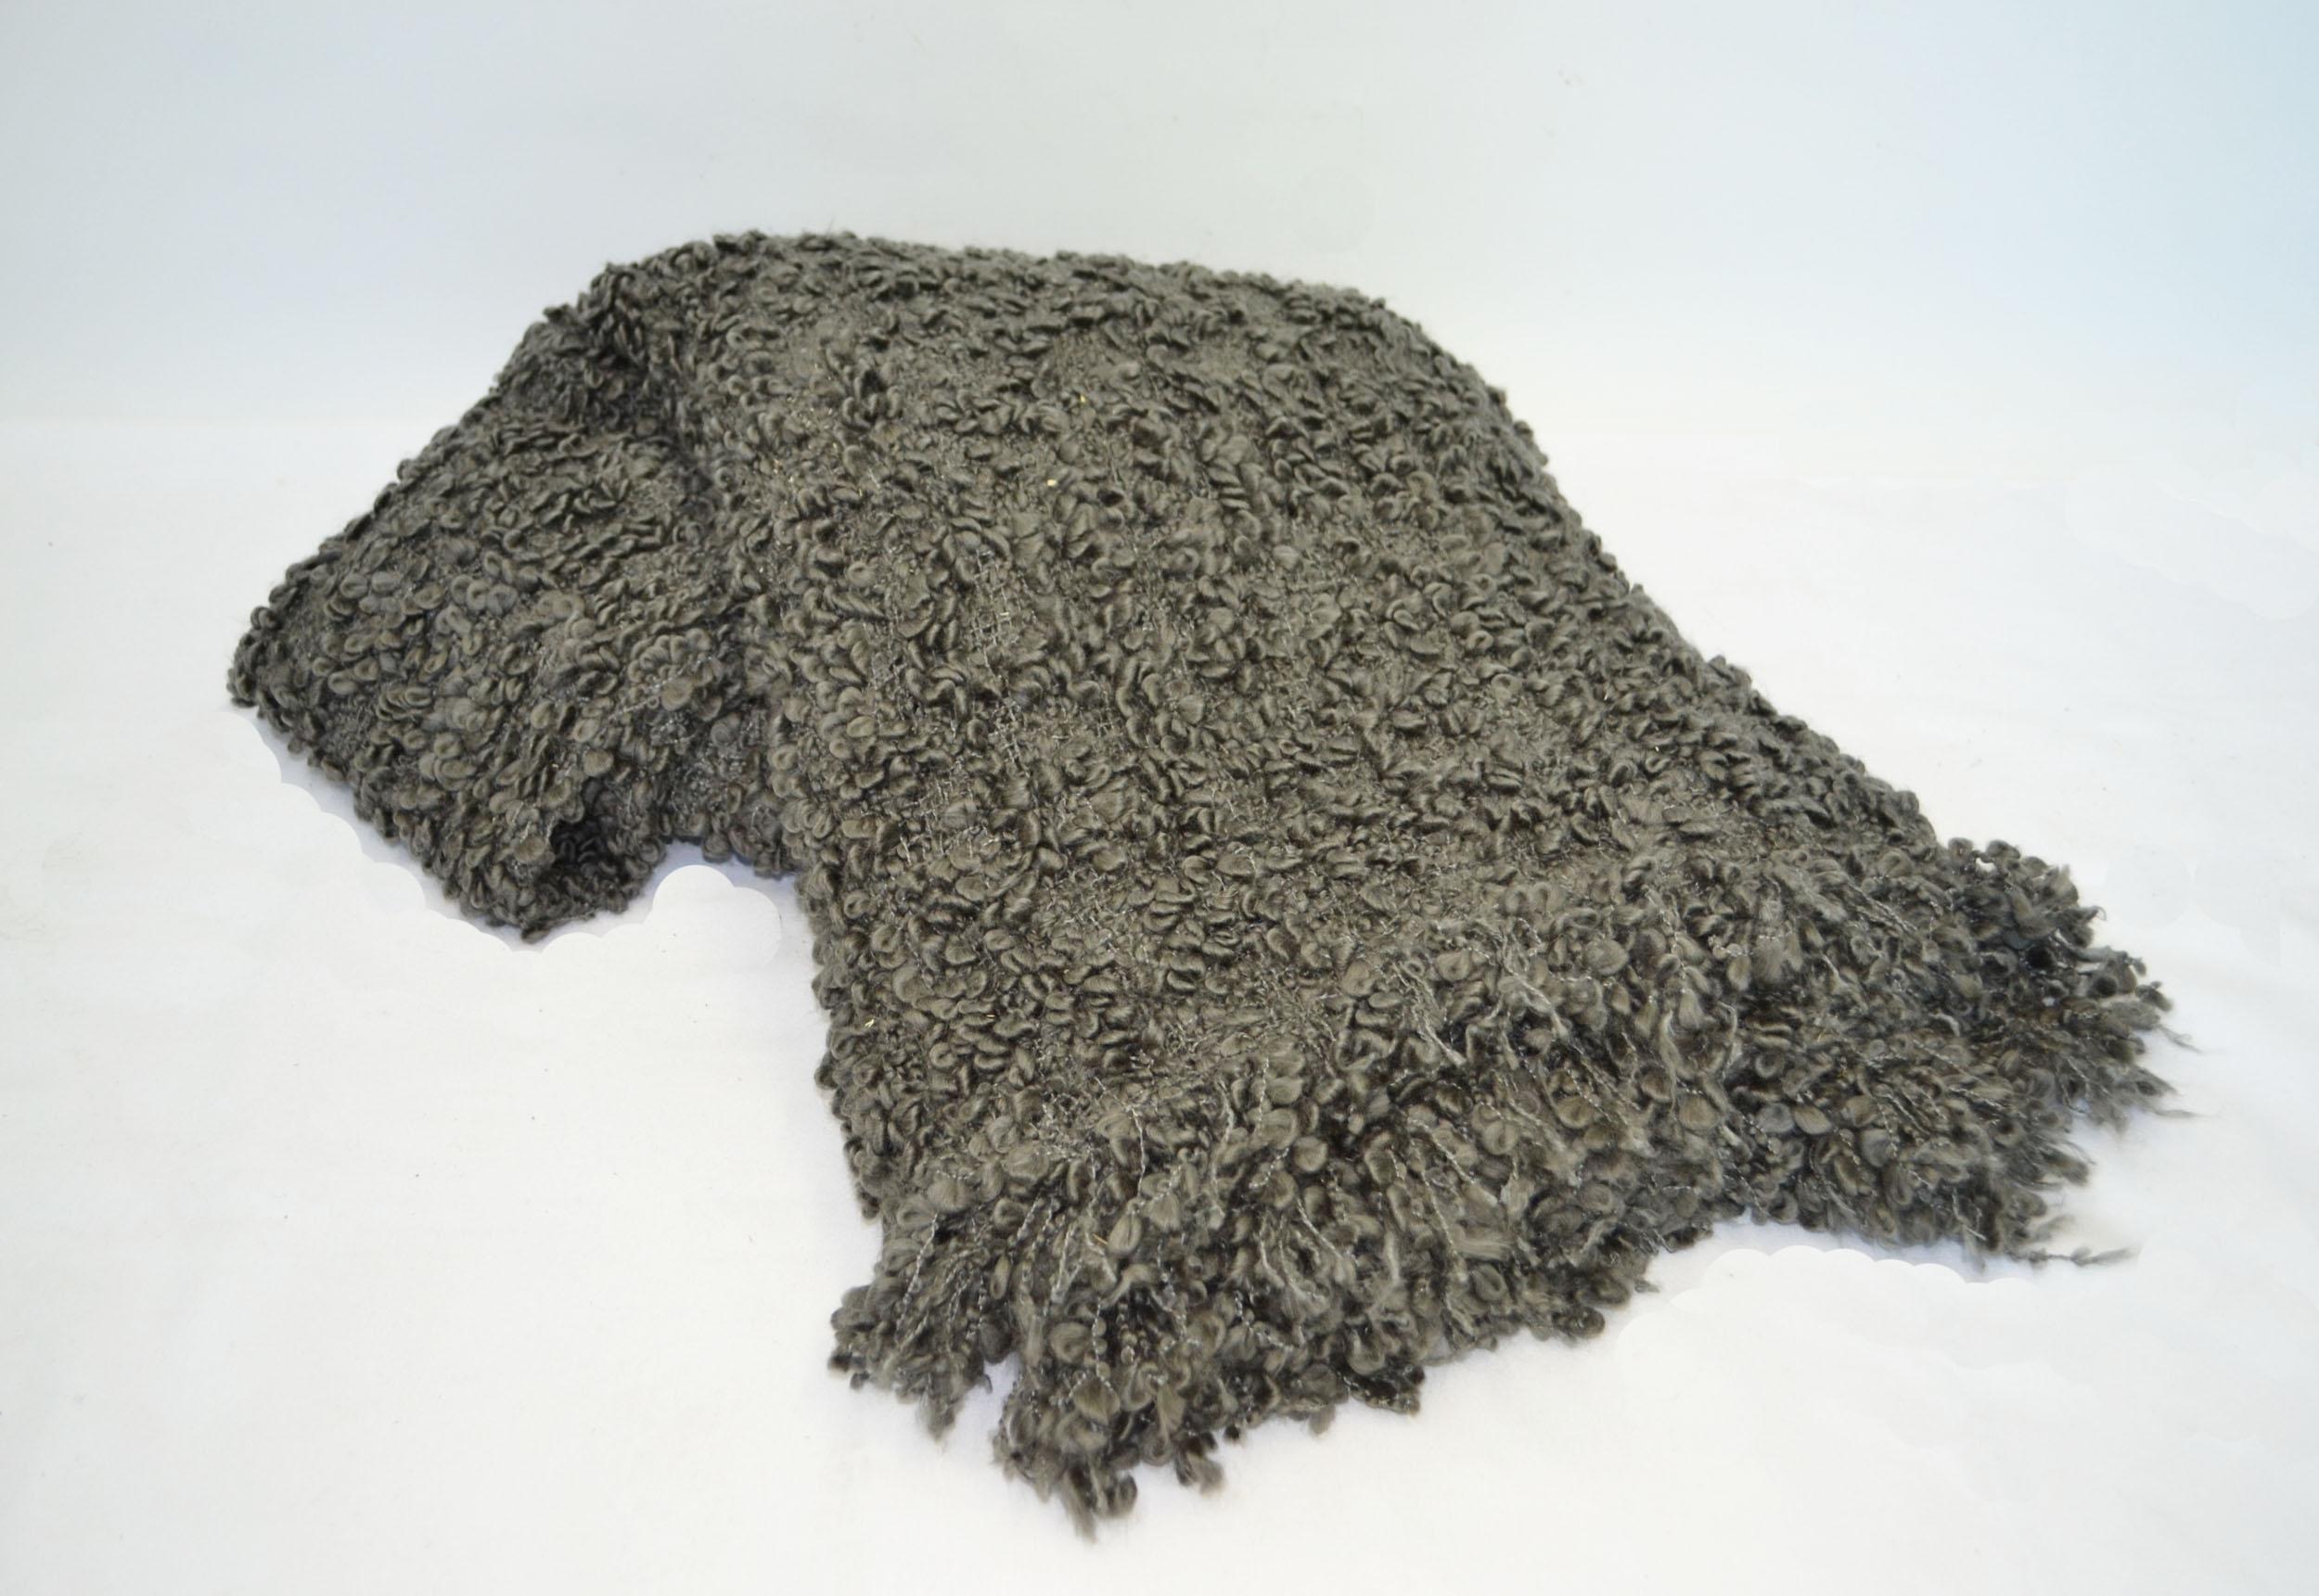 grey shag throw blanket   Quantity: 1  Price: $5.50